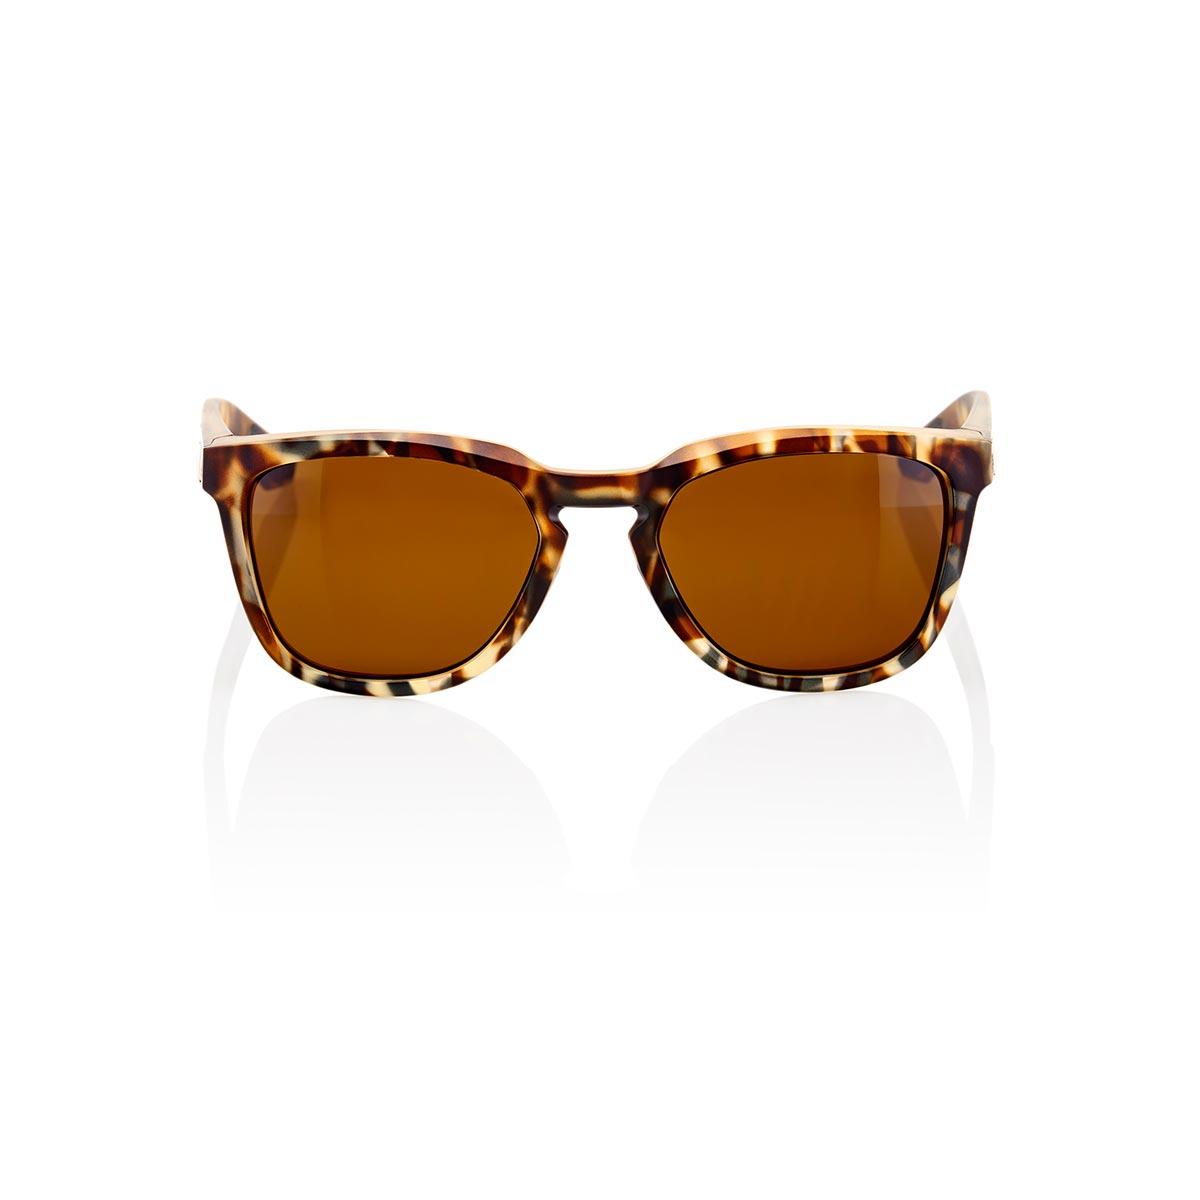 543340e1c4 Hudson Matte Havana w  Bronze Lens - Pure Endurance